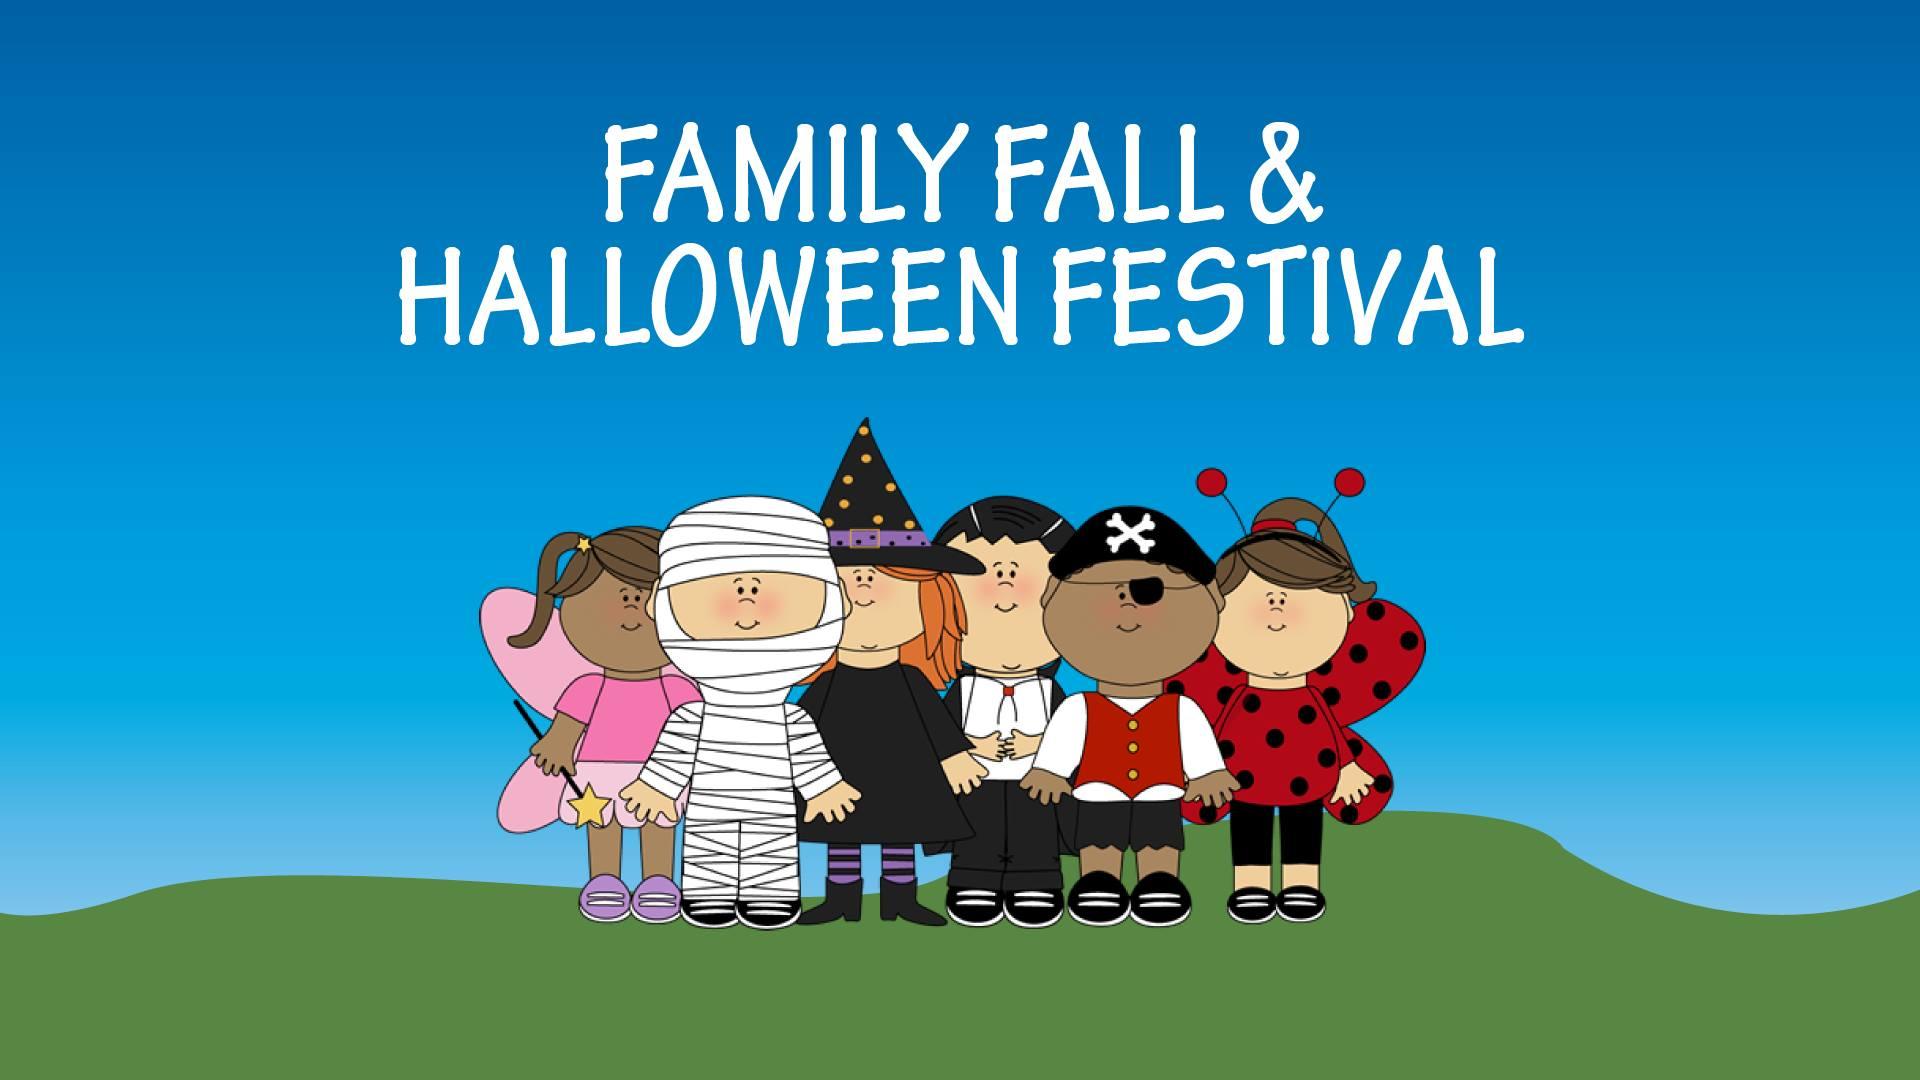 Halloween Festivals 2020 Melville Ny Fall Festival   Long Island Weekly